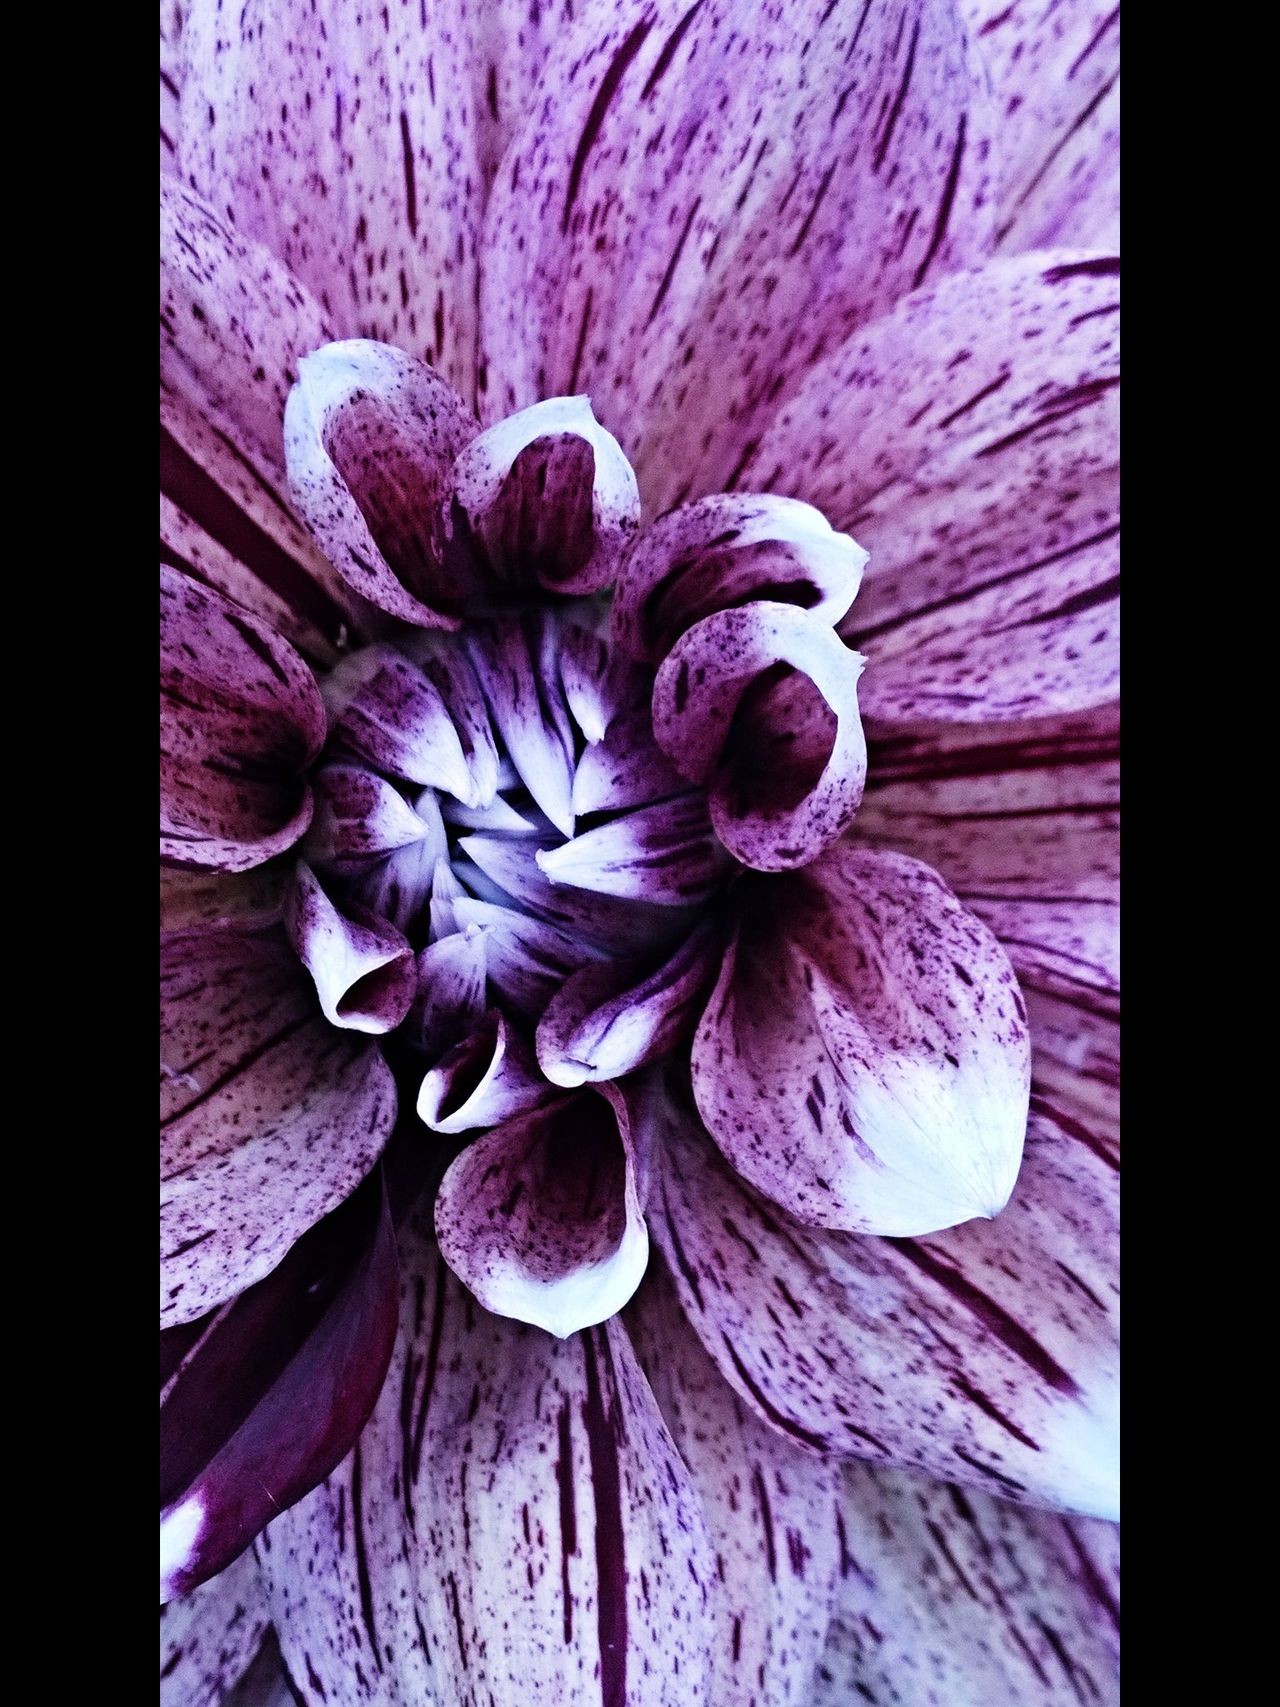 Flowerporn Flowers StreamzooFlowers StreamzooPics Malephotographerofthemonth The Ville EyeEm Best Shots Streamzoofamily Tadaa Community Eye4photography